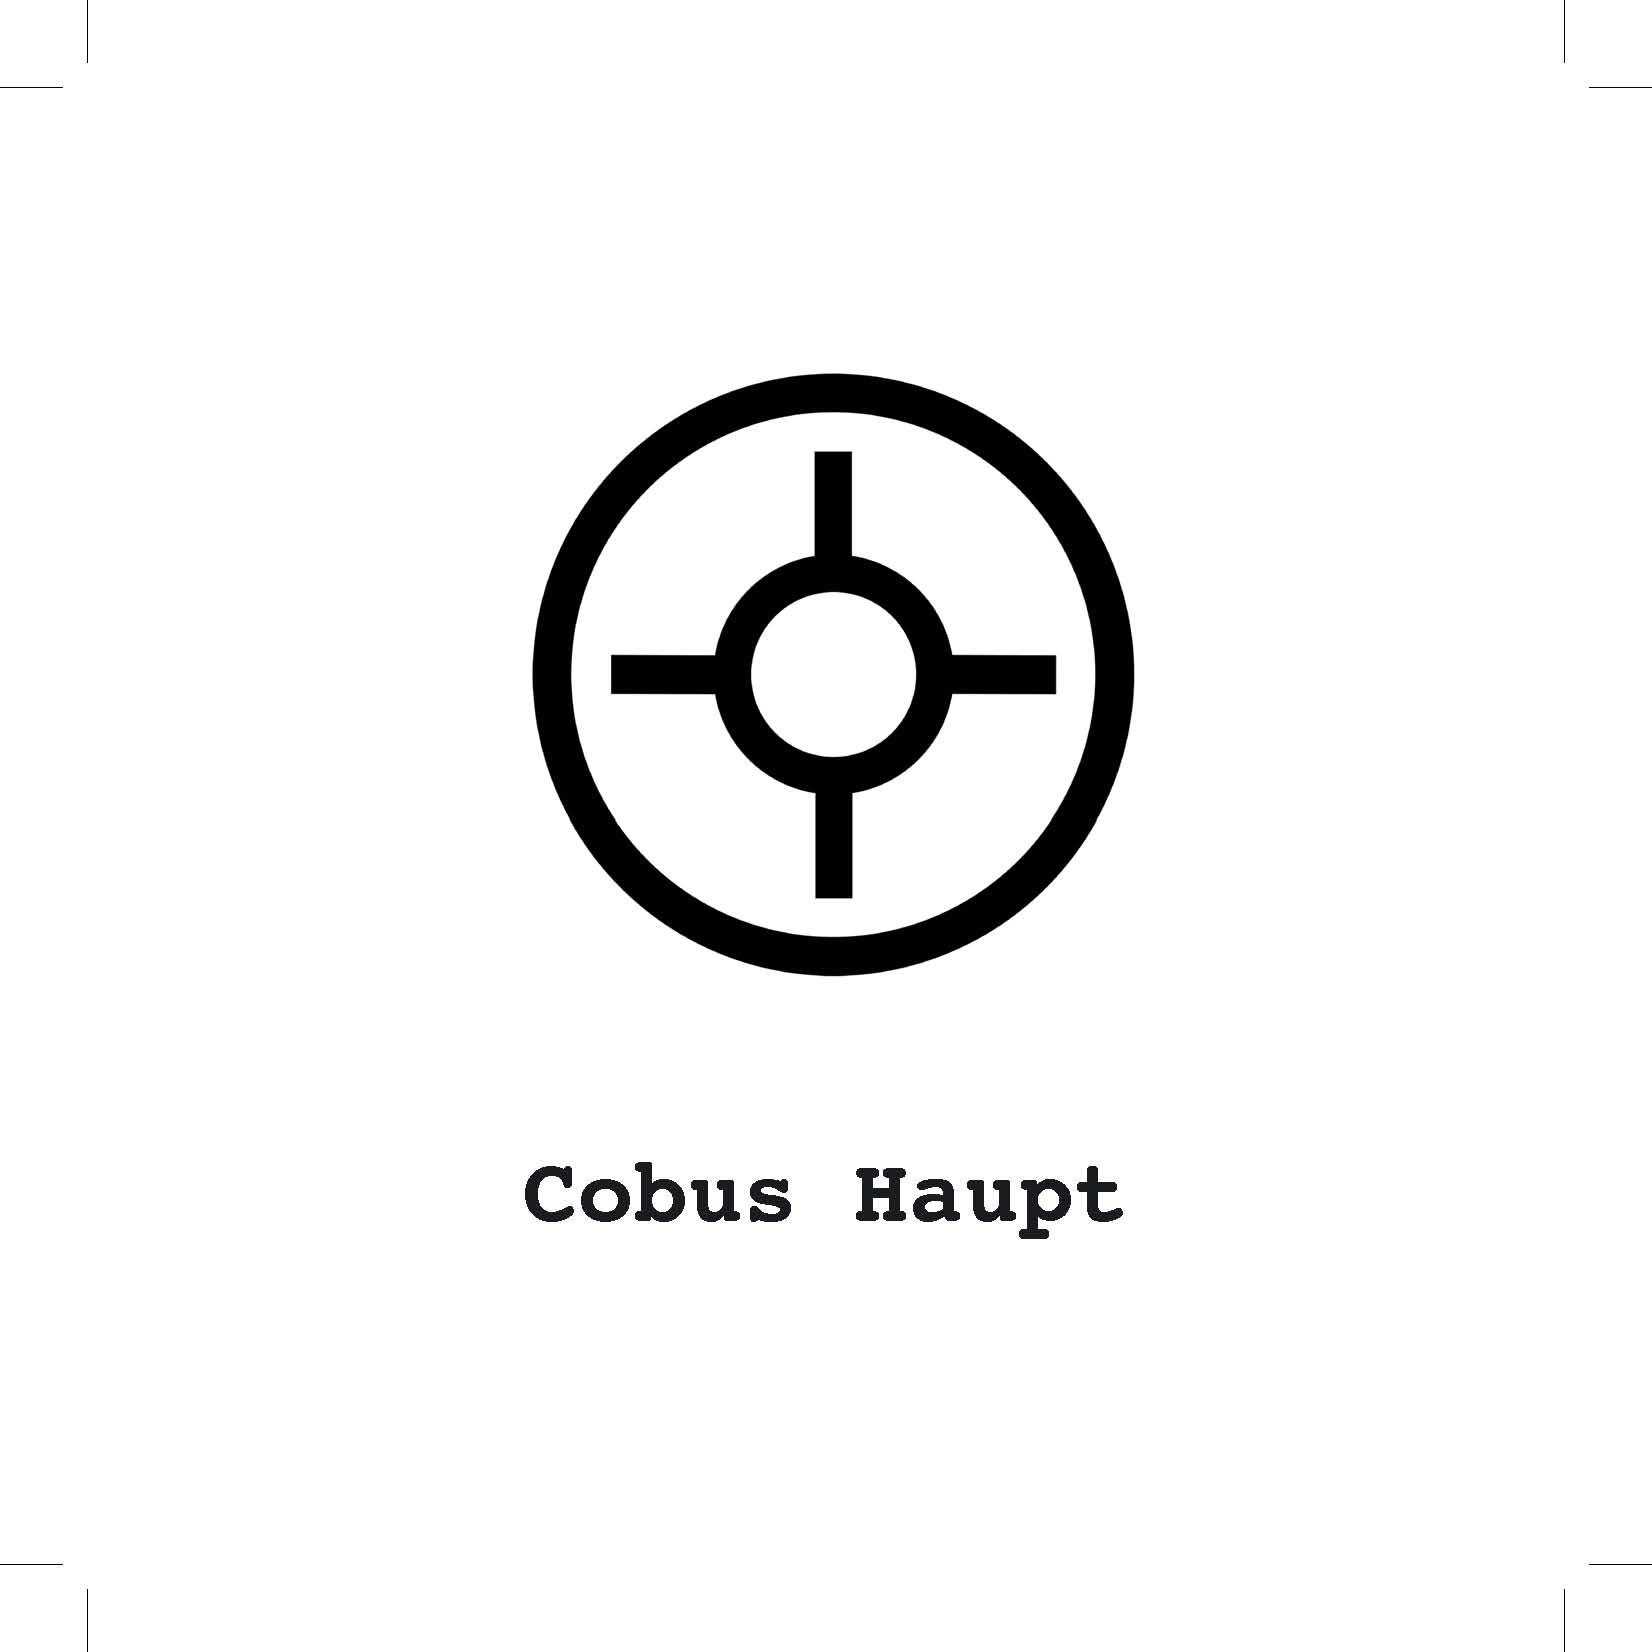 MAP Southafrica - Cobus Haupt